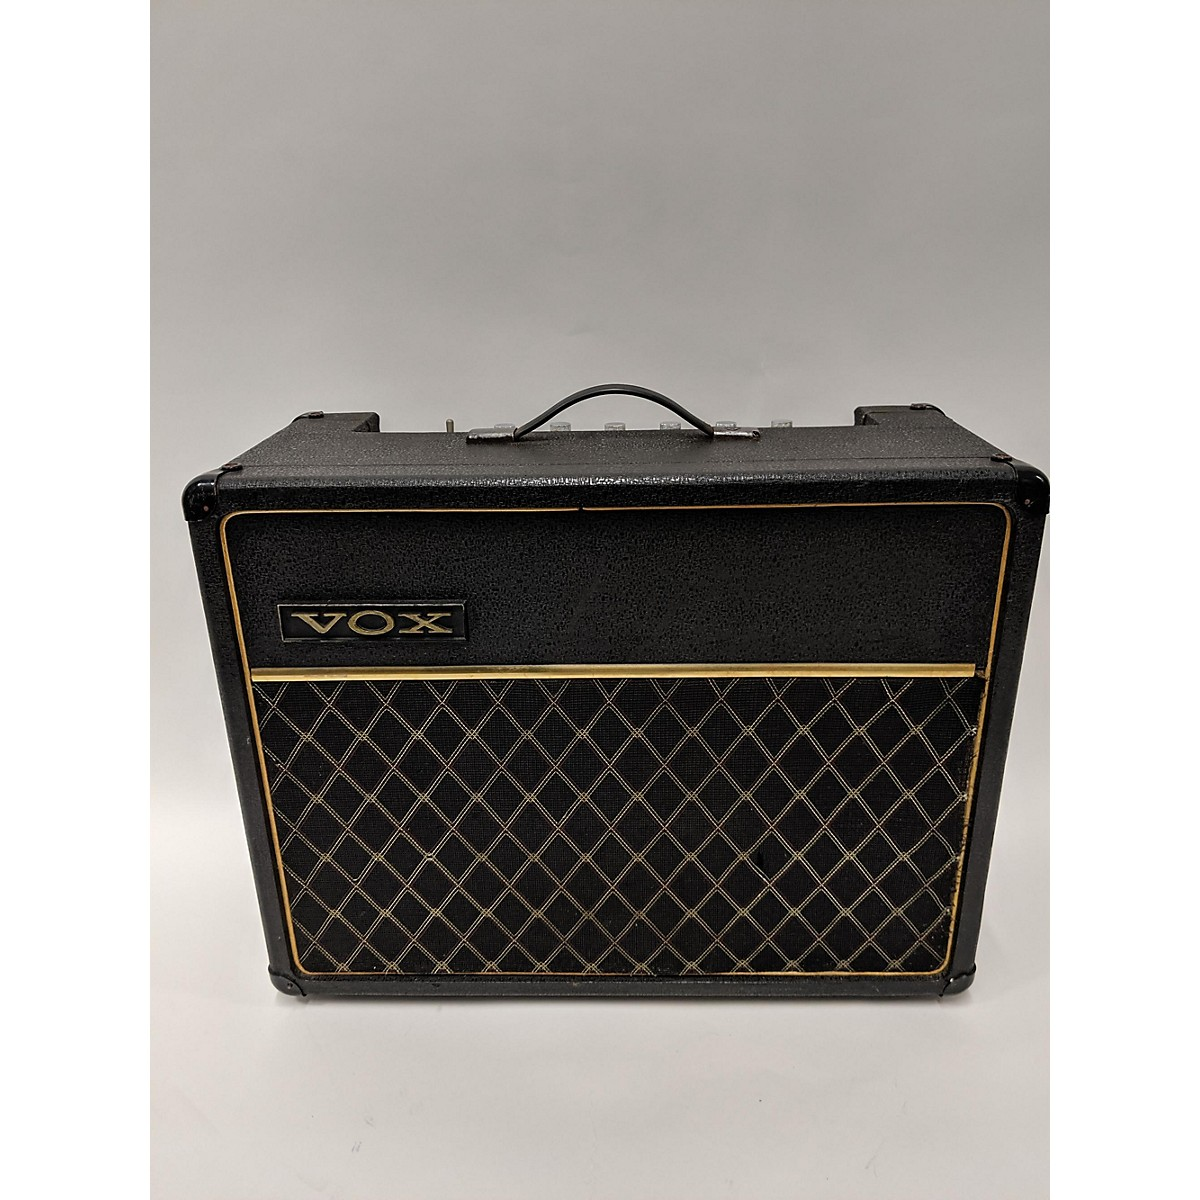 Vox 1966 Cambridge Reverb Guitar Combo Amp